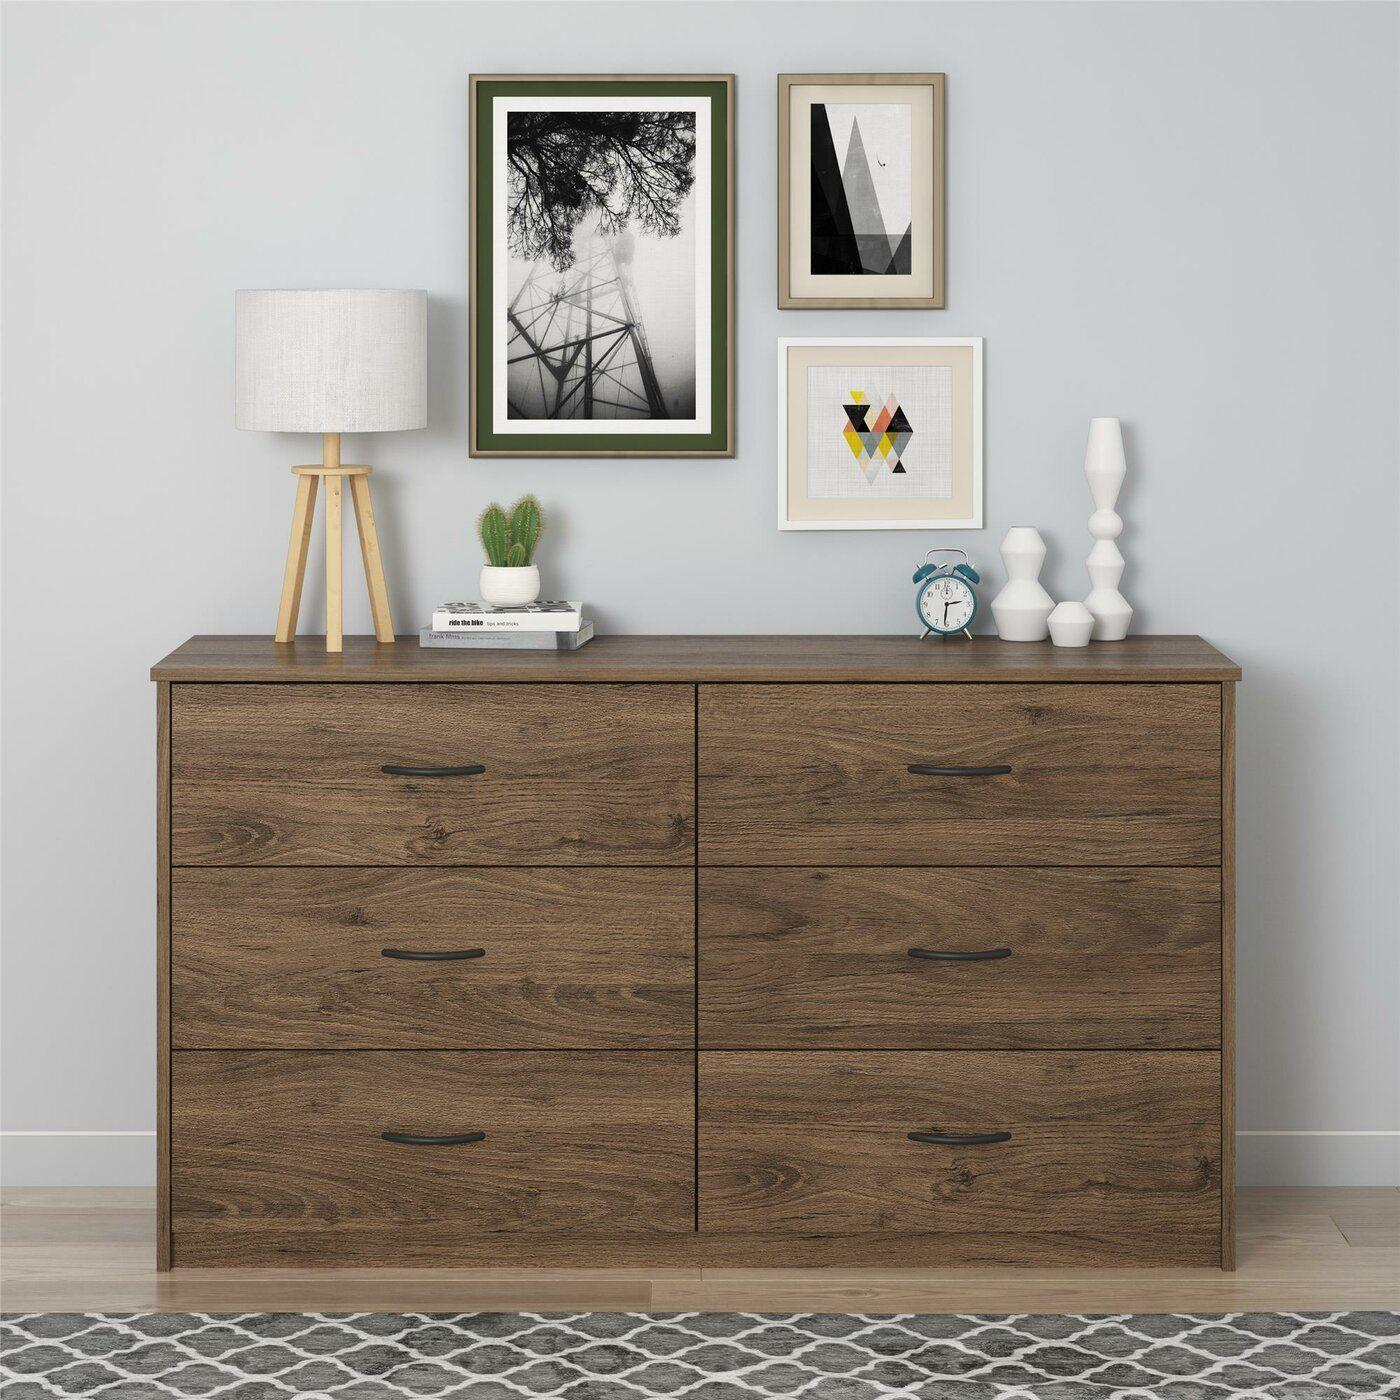 Grantville 6 Drawer Dresser 6 Drawer Dresser Furniture Dresser [ 1400 x 1400 Pixel ]